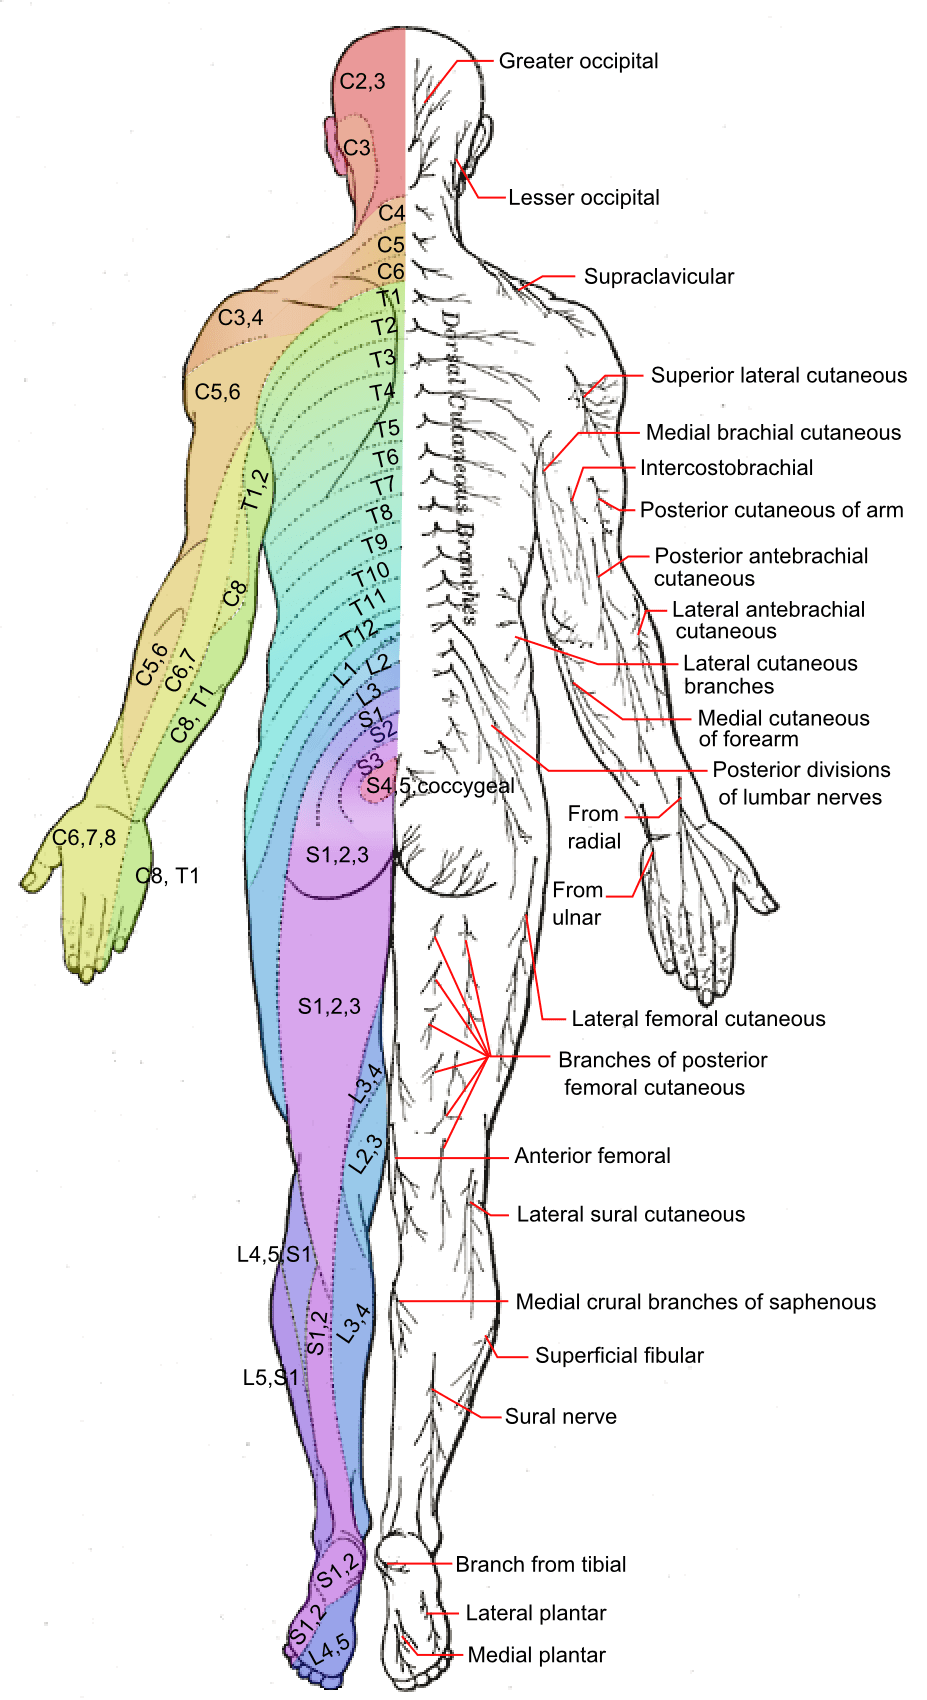 diagram of sciatic nerve leg starter motor wiring chevy axial line (dermatomes) - wikipedia